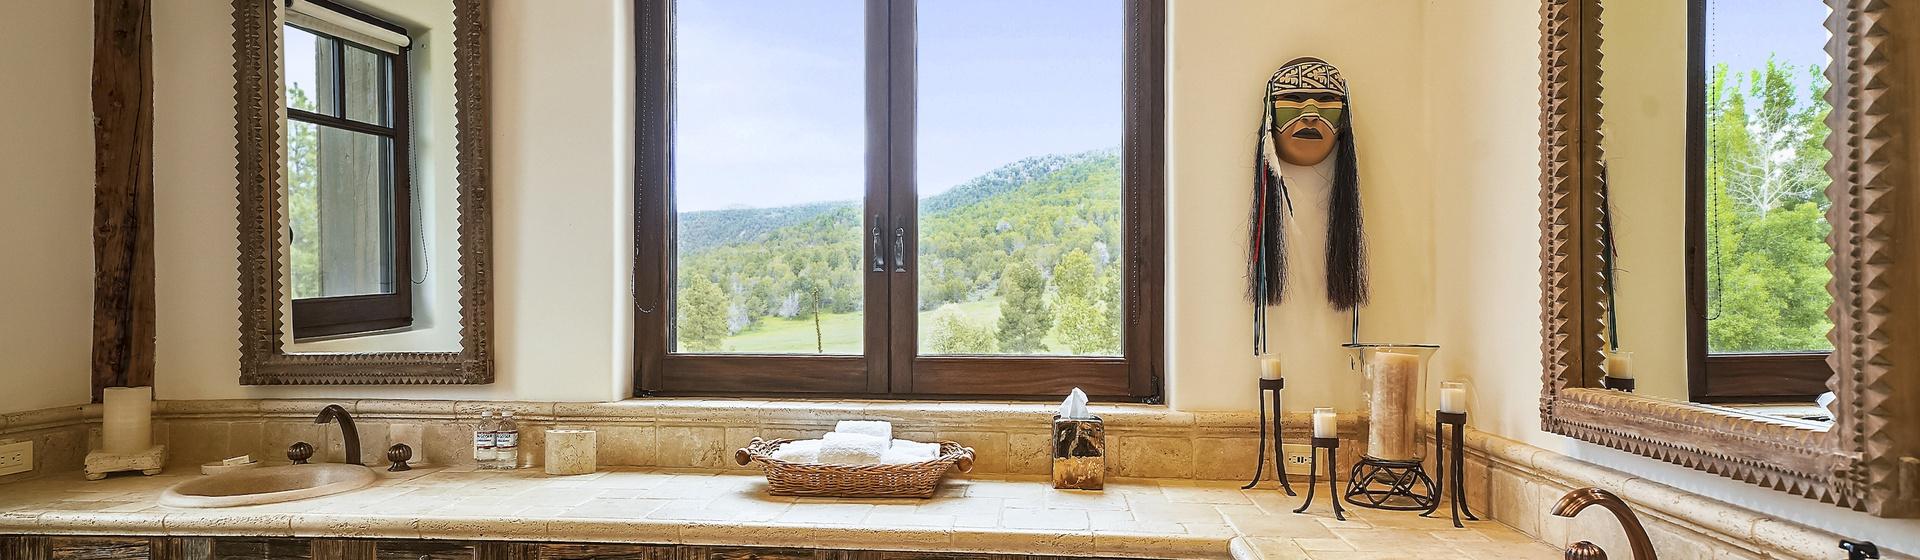 8.8-Telluride-Sleeping-Indian-Ranch-Southwest-Suite-Master-Bathroom-G-web.JPG